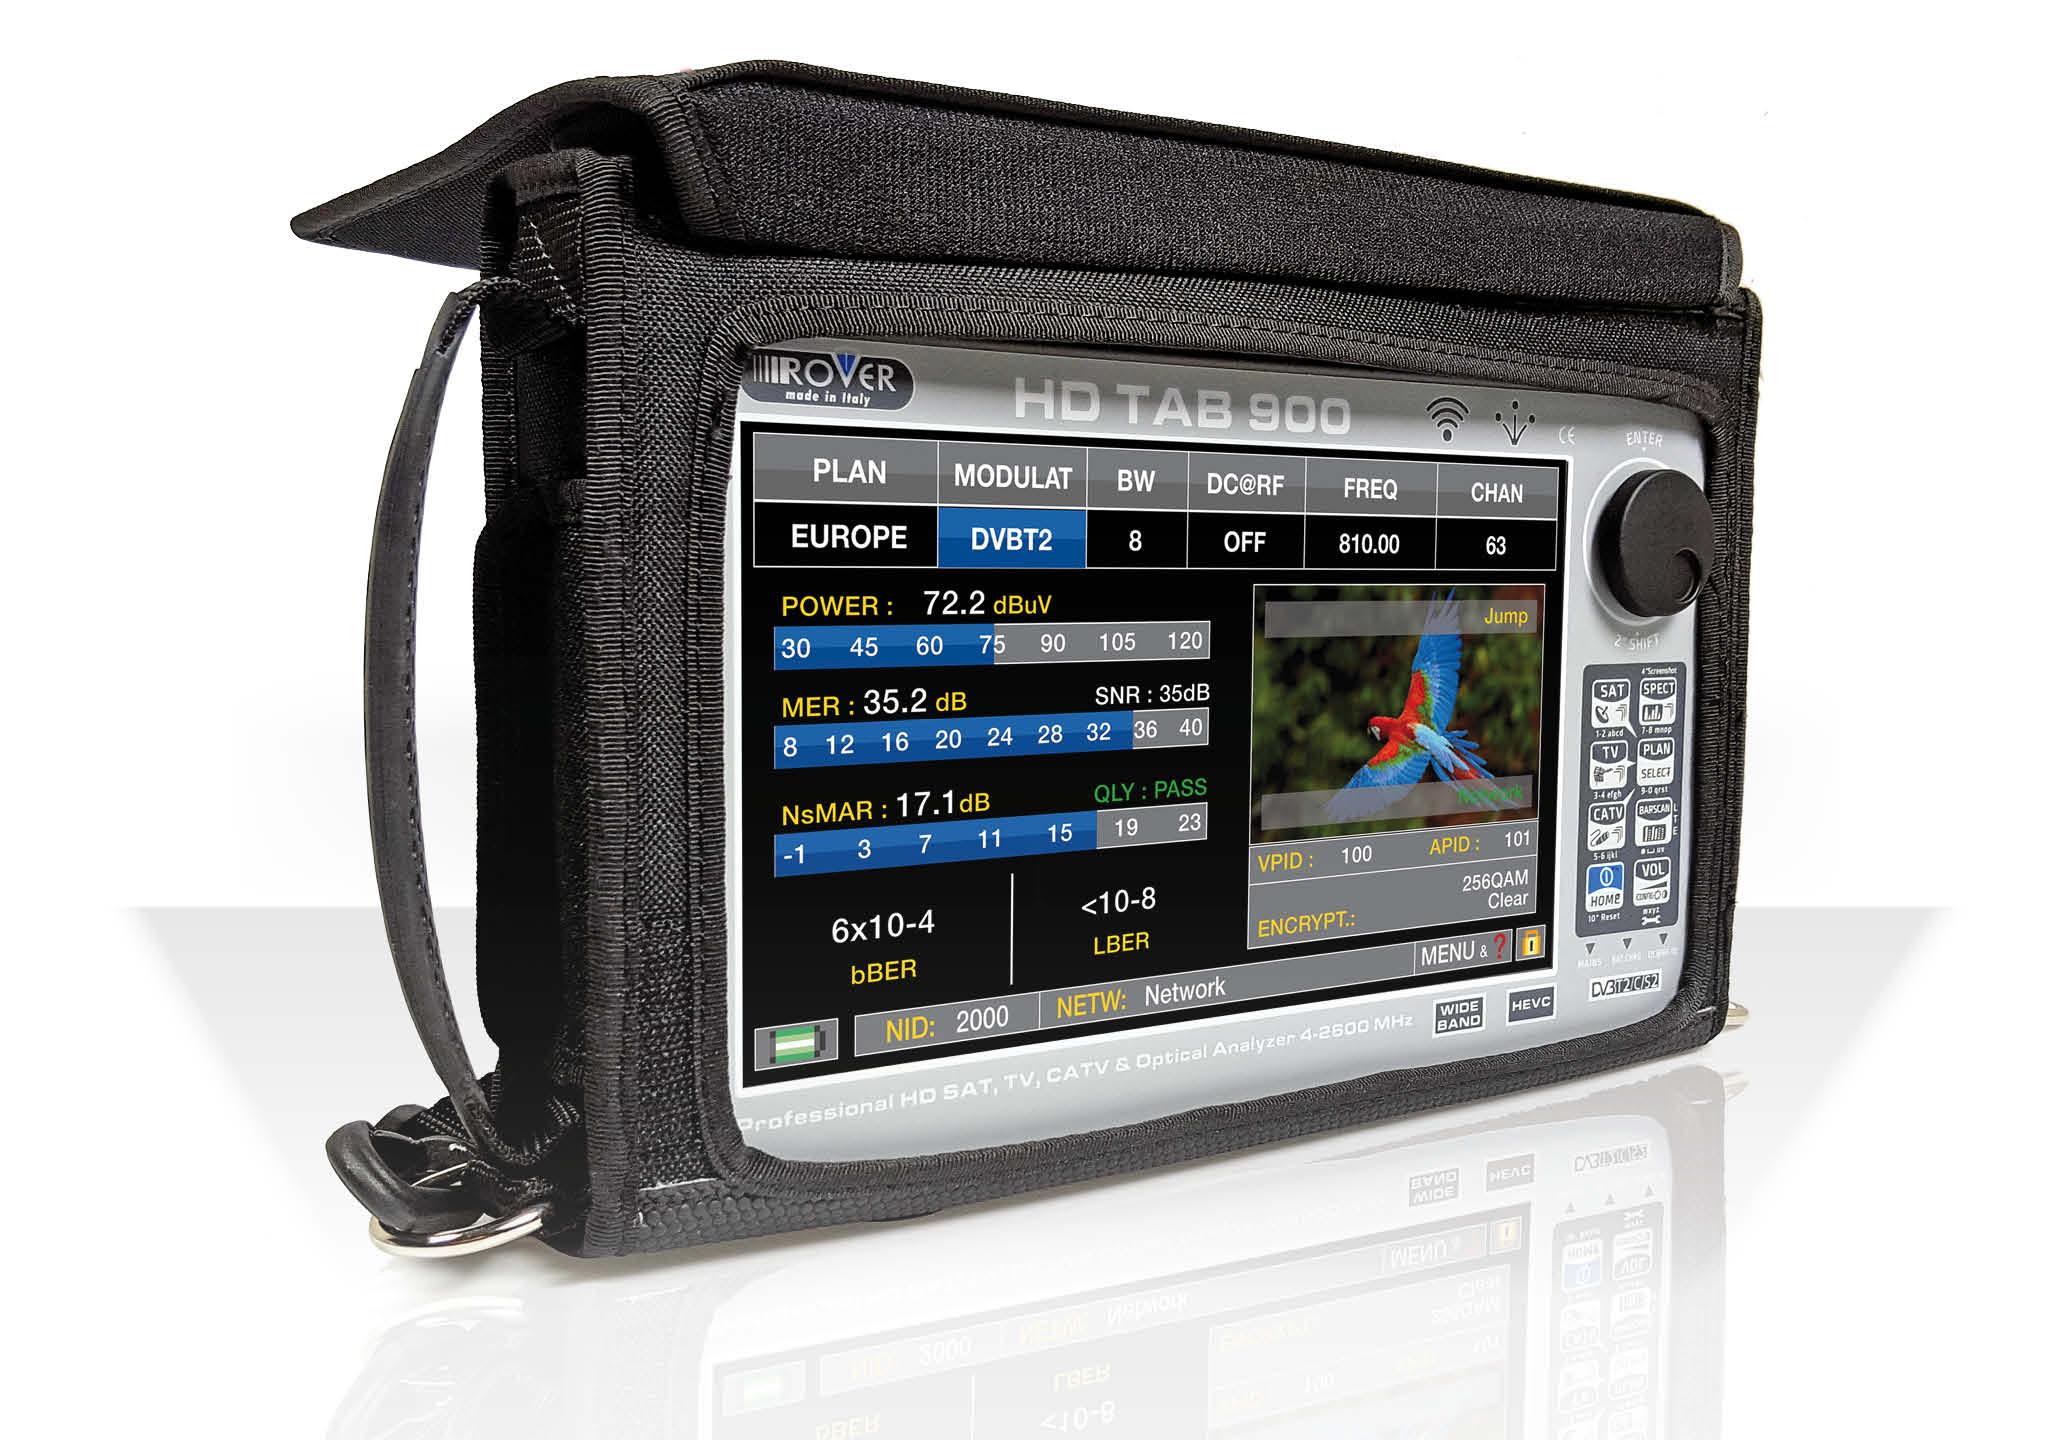 HD TAB 900 Plus - Rover Laboratories